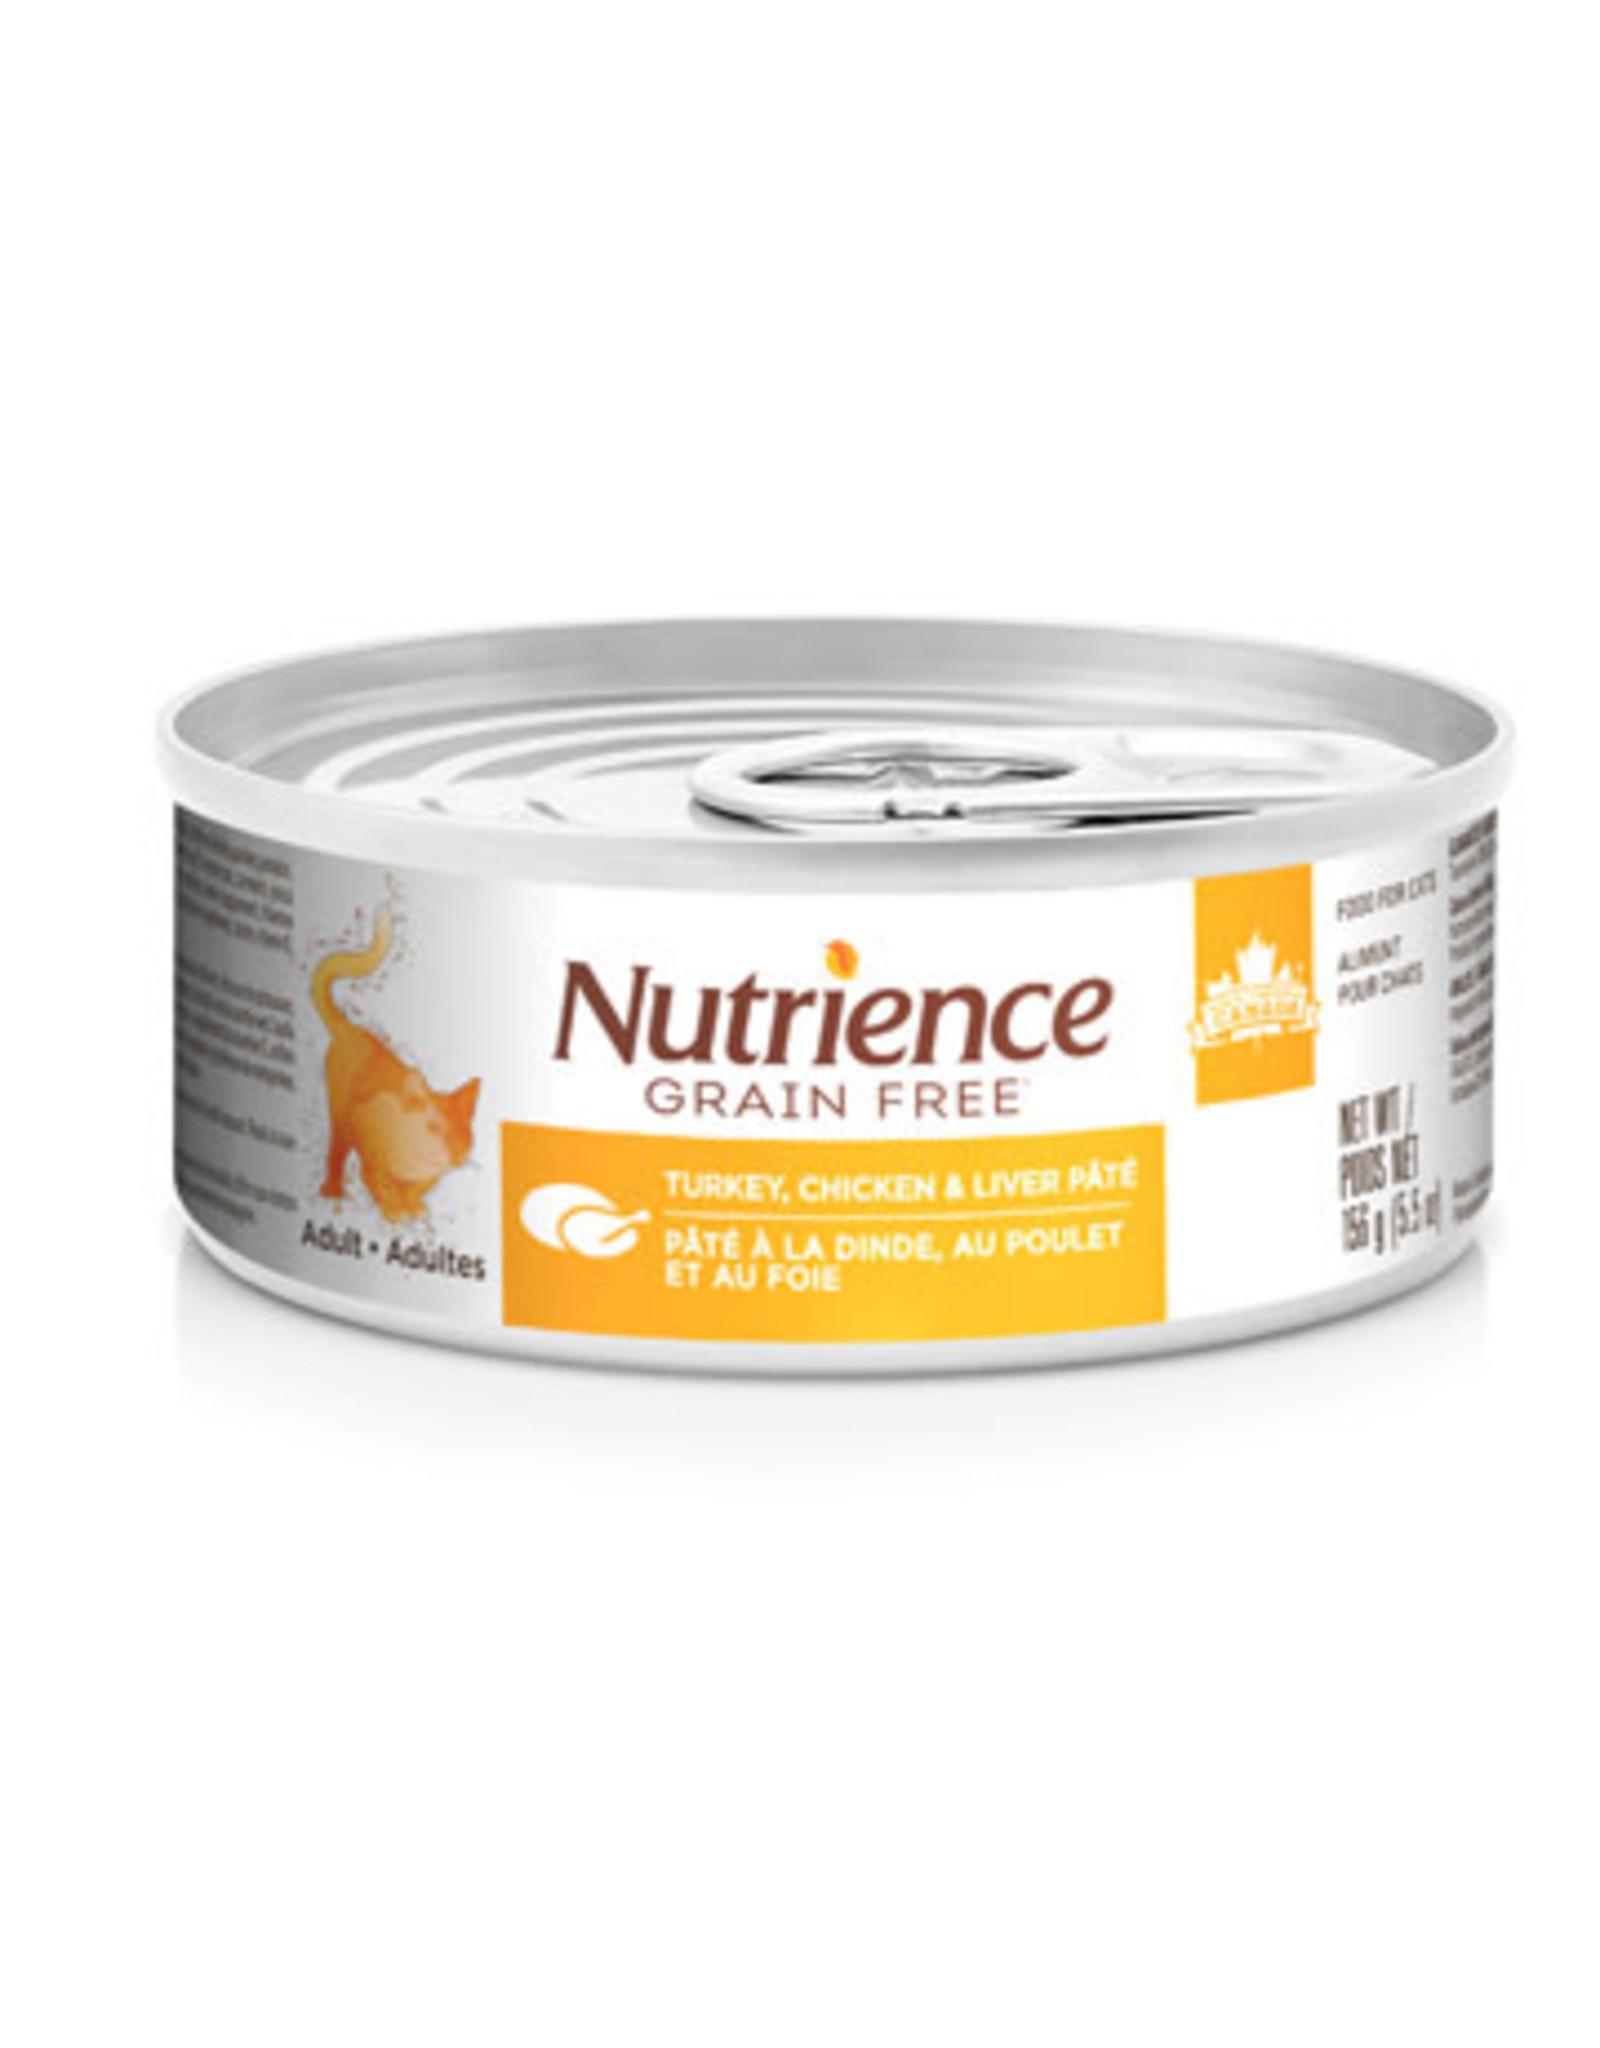 Nutrience Nutrience Grain Free Turkey, Chicken & Liver Pate - 156g